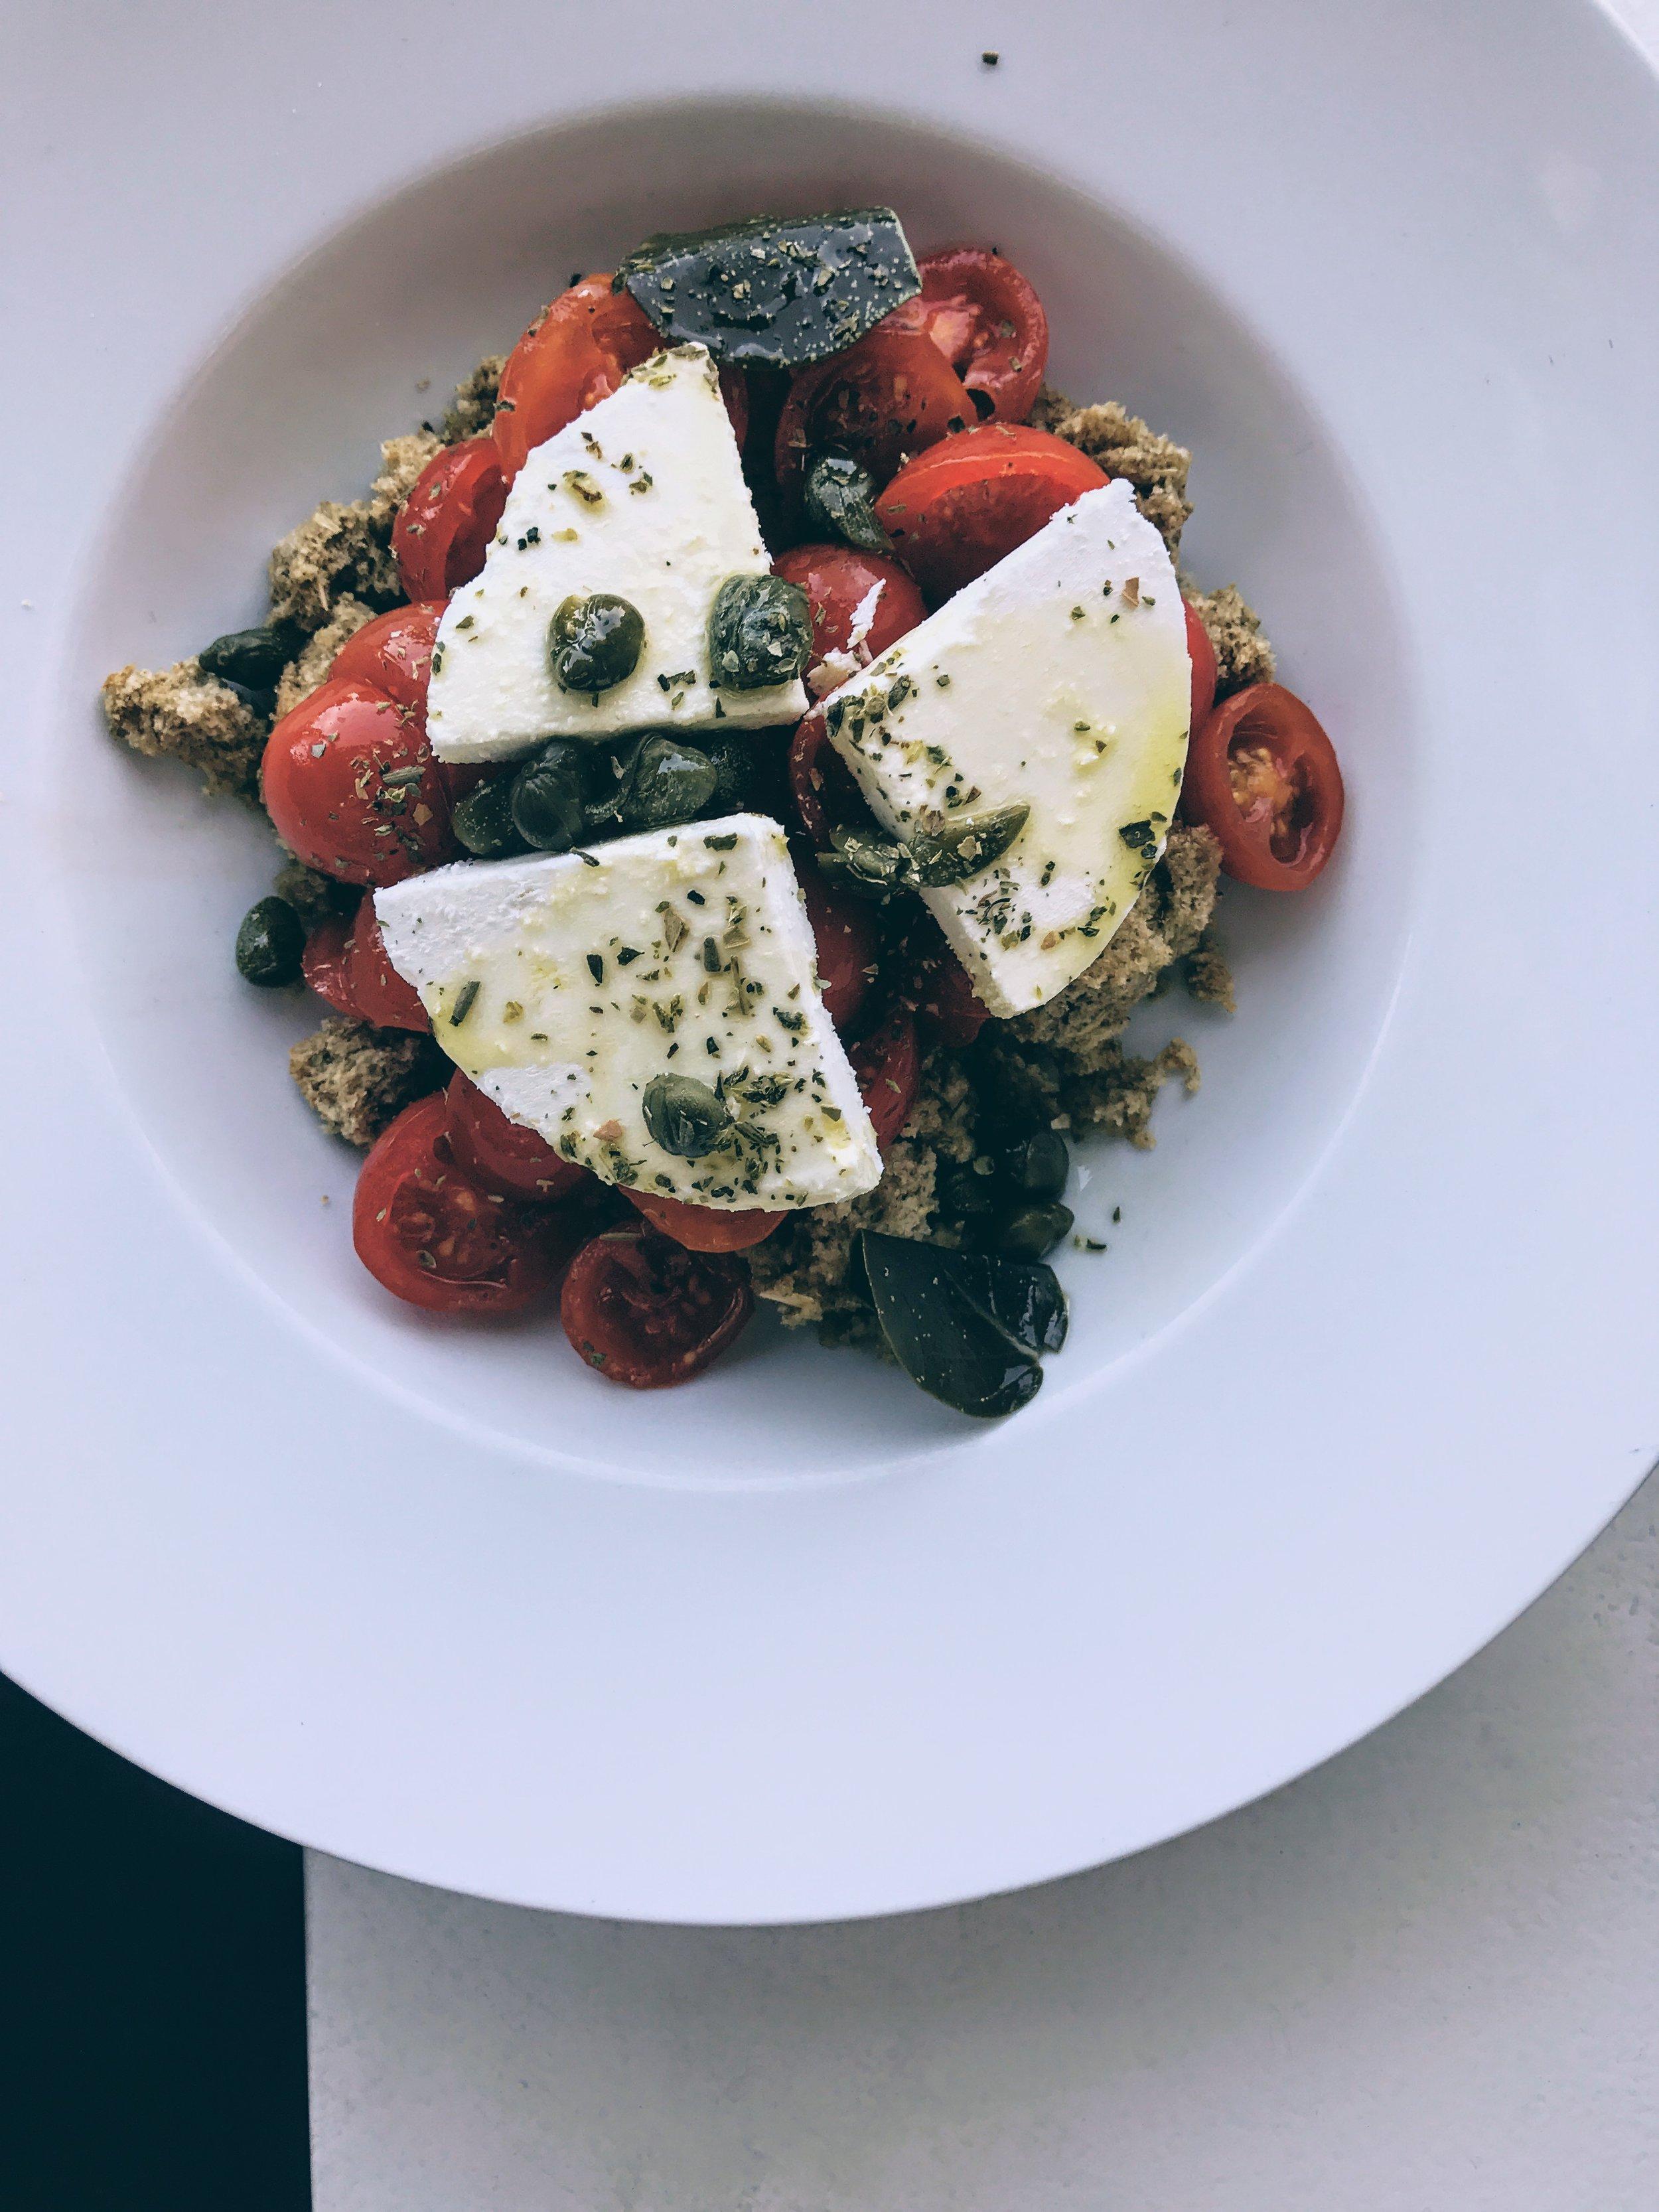 Pomodorini tomato salad with Cretan rusk, caper leaves and Mykonos xinomizithra cheese